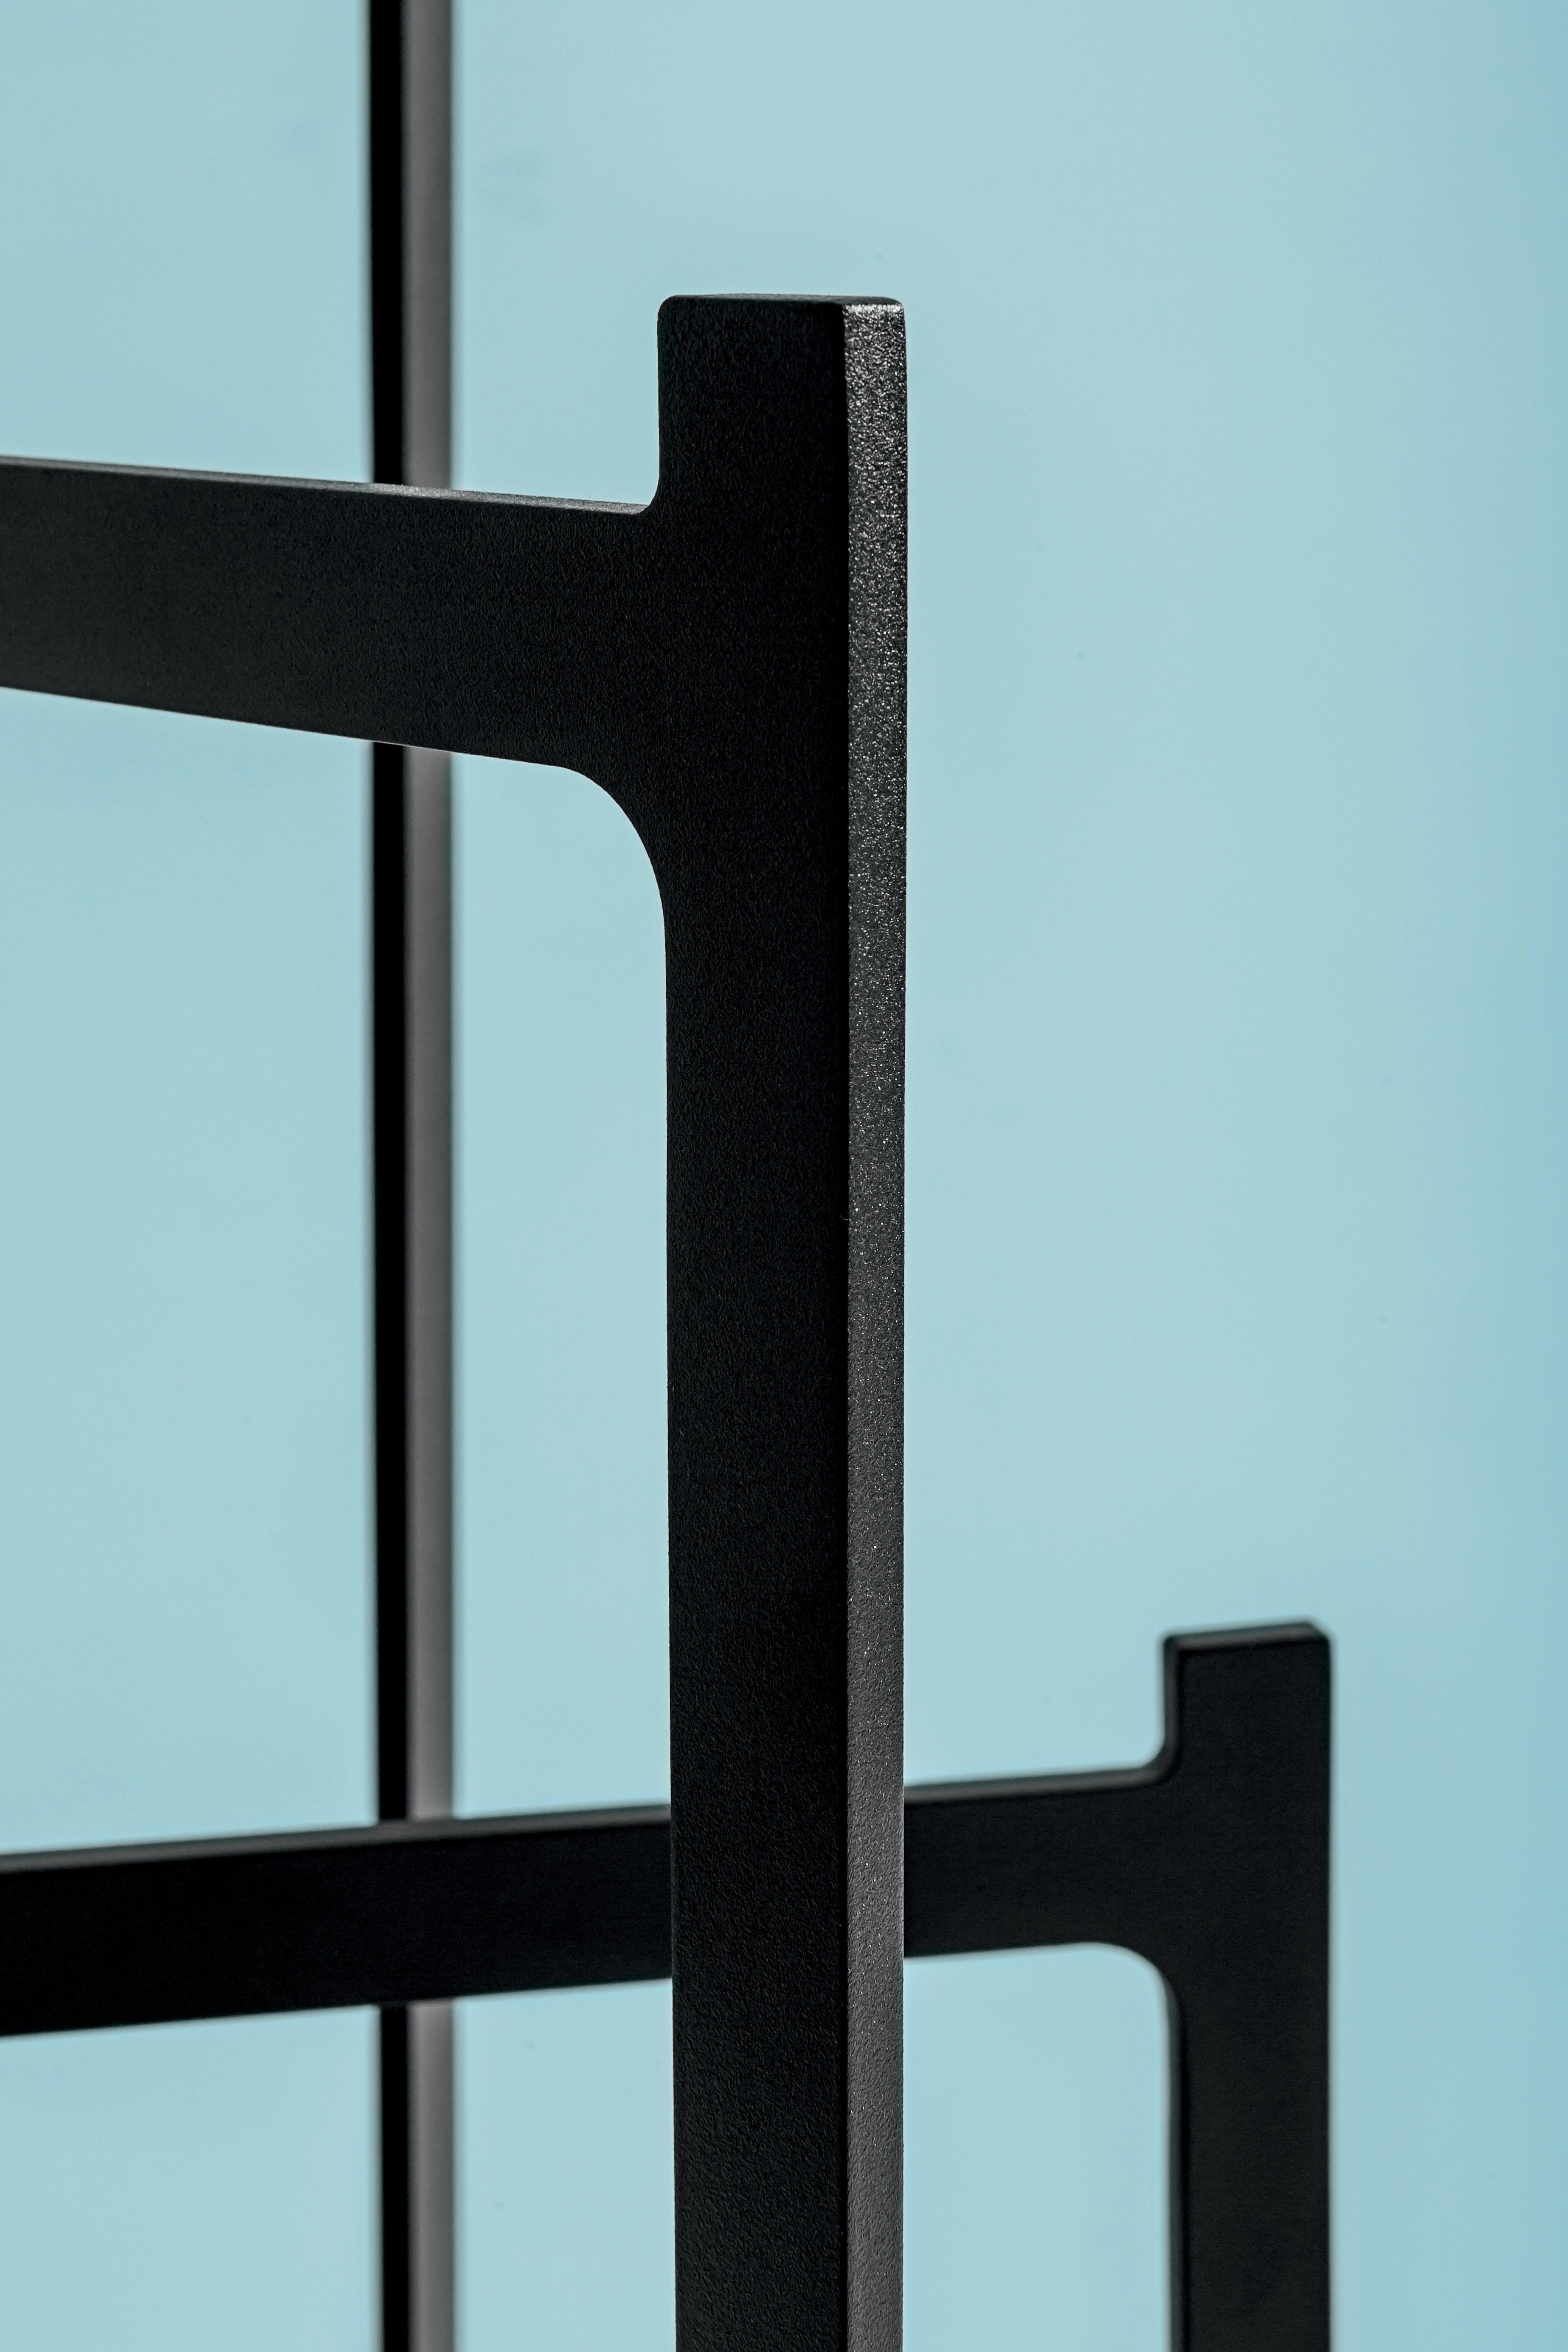 Discipline Black Clip Coat Hanger Detail Haute Living